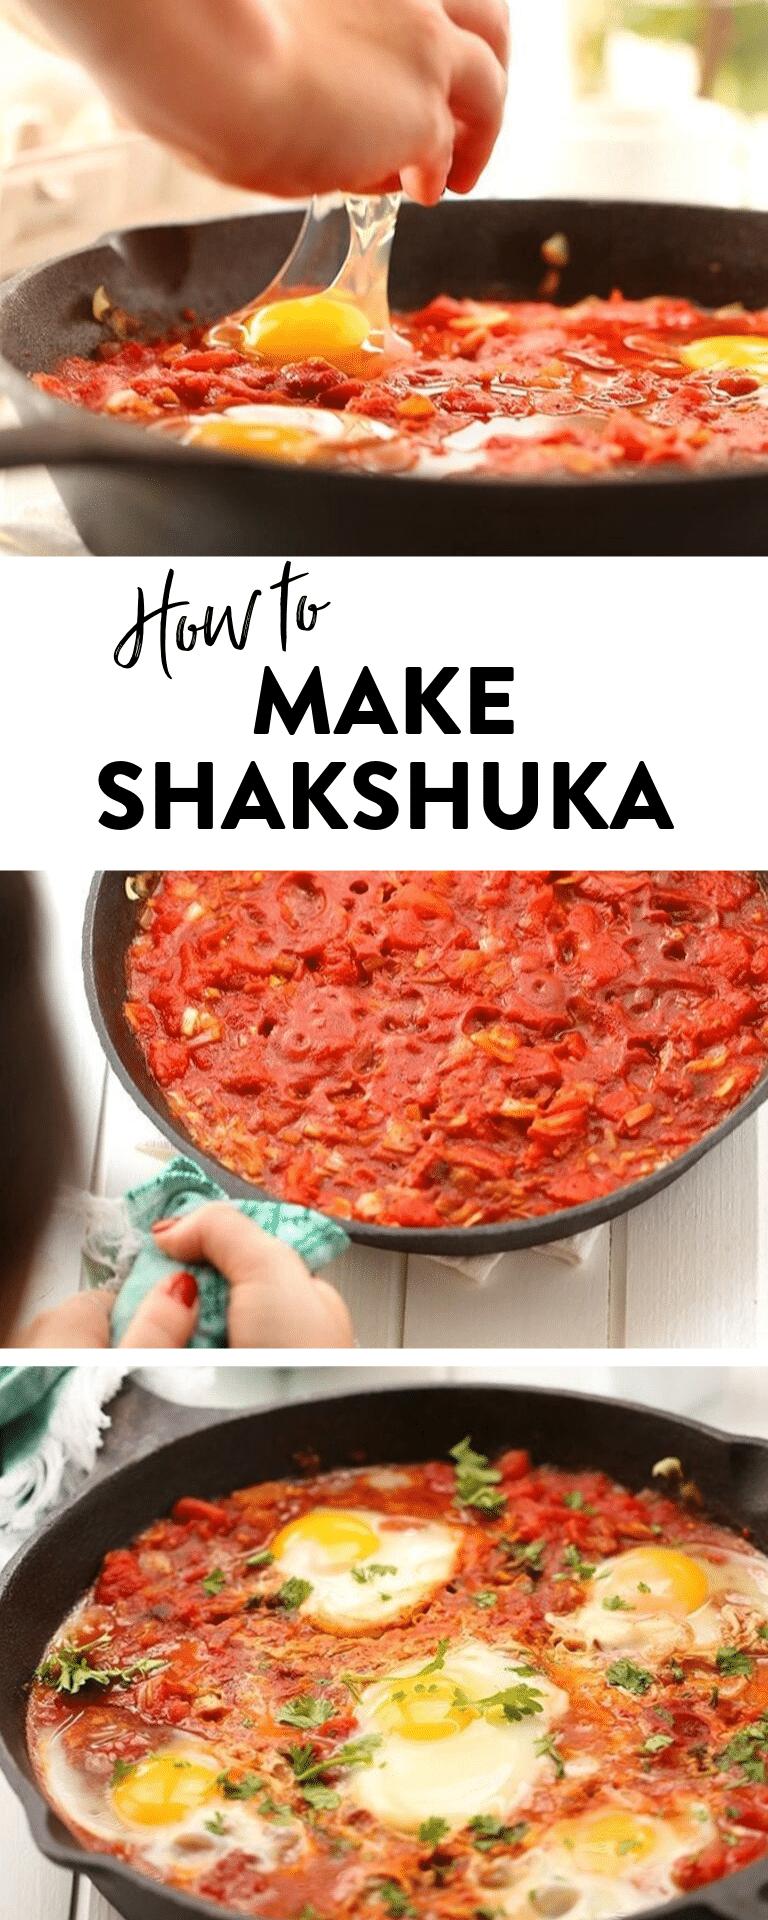 Have you wanted to learn how to make shakshuka? This easy shakshuka recipe teaches you how to make this traditional israeli shakshuka from scratch! #shakshuka